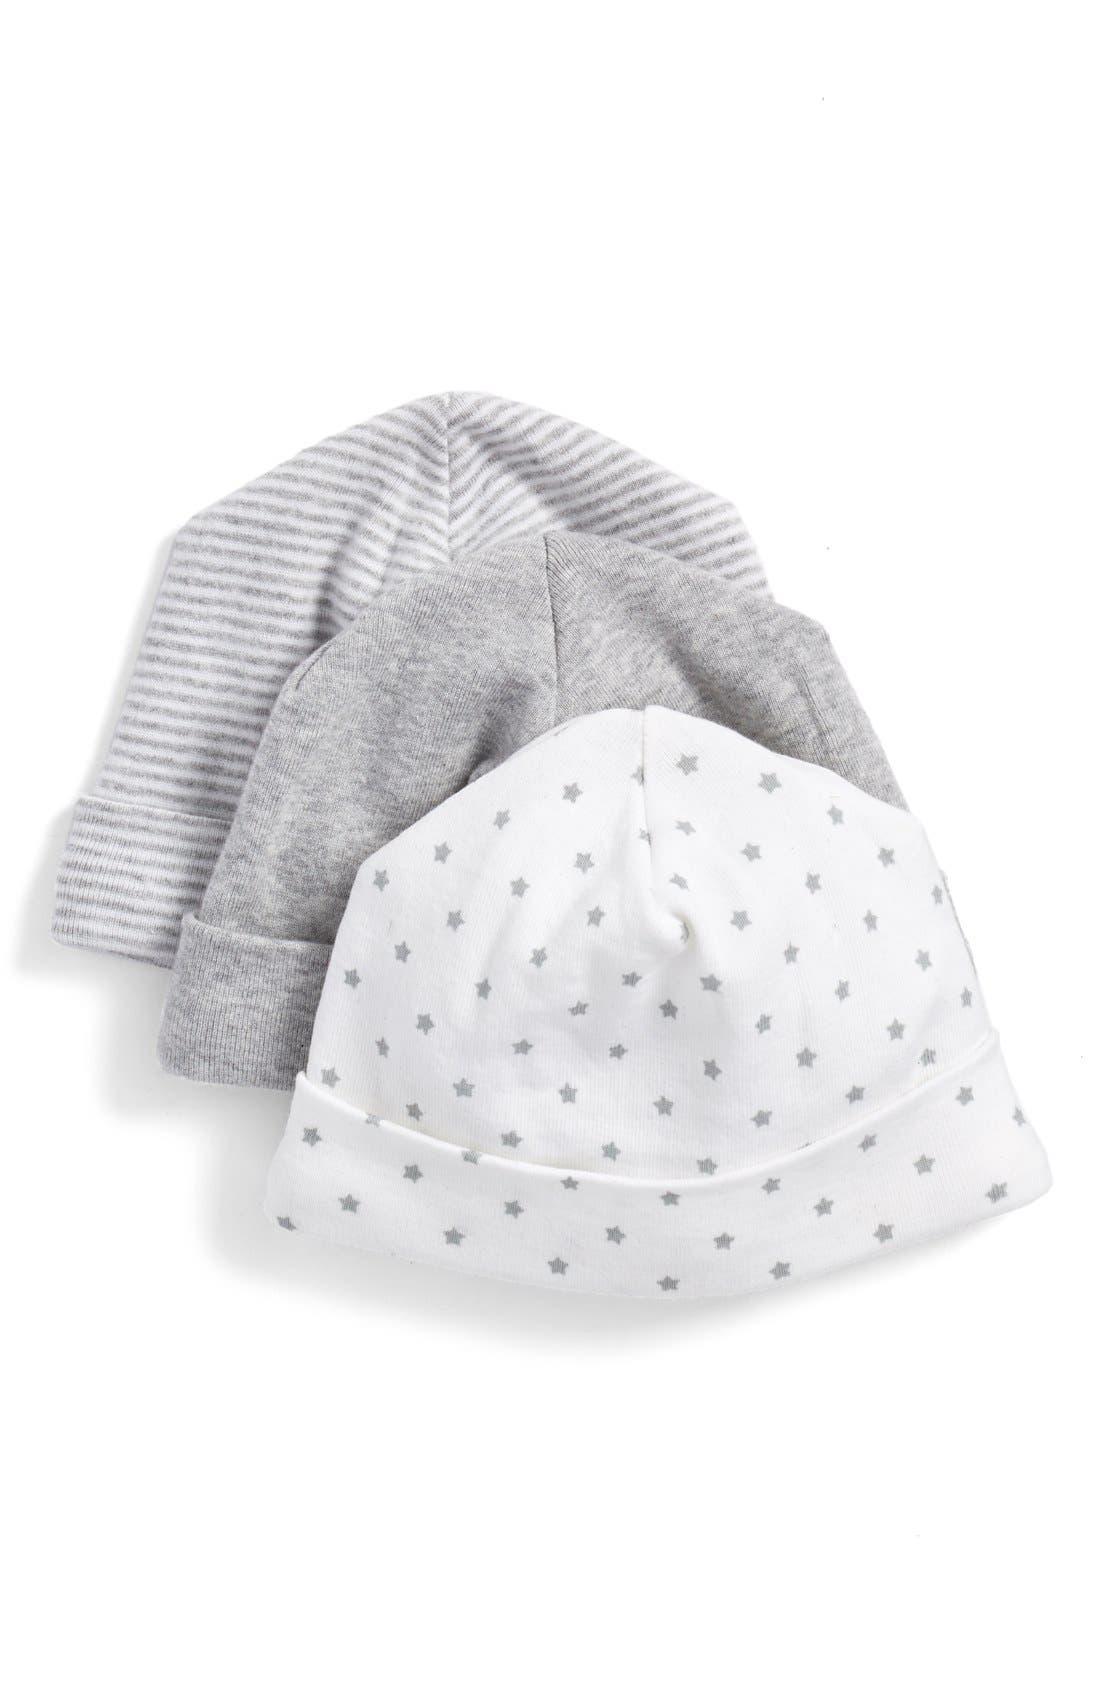 Cotton Hats,                         Main,                         color, Grey Ash Heather Pack